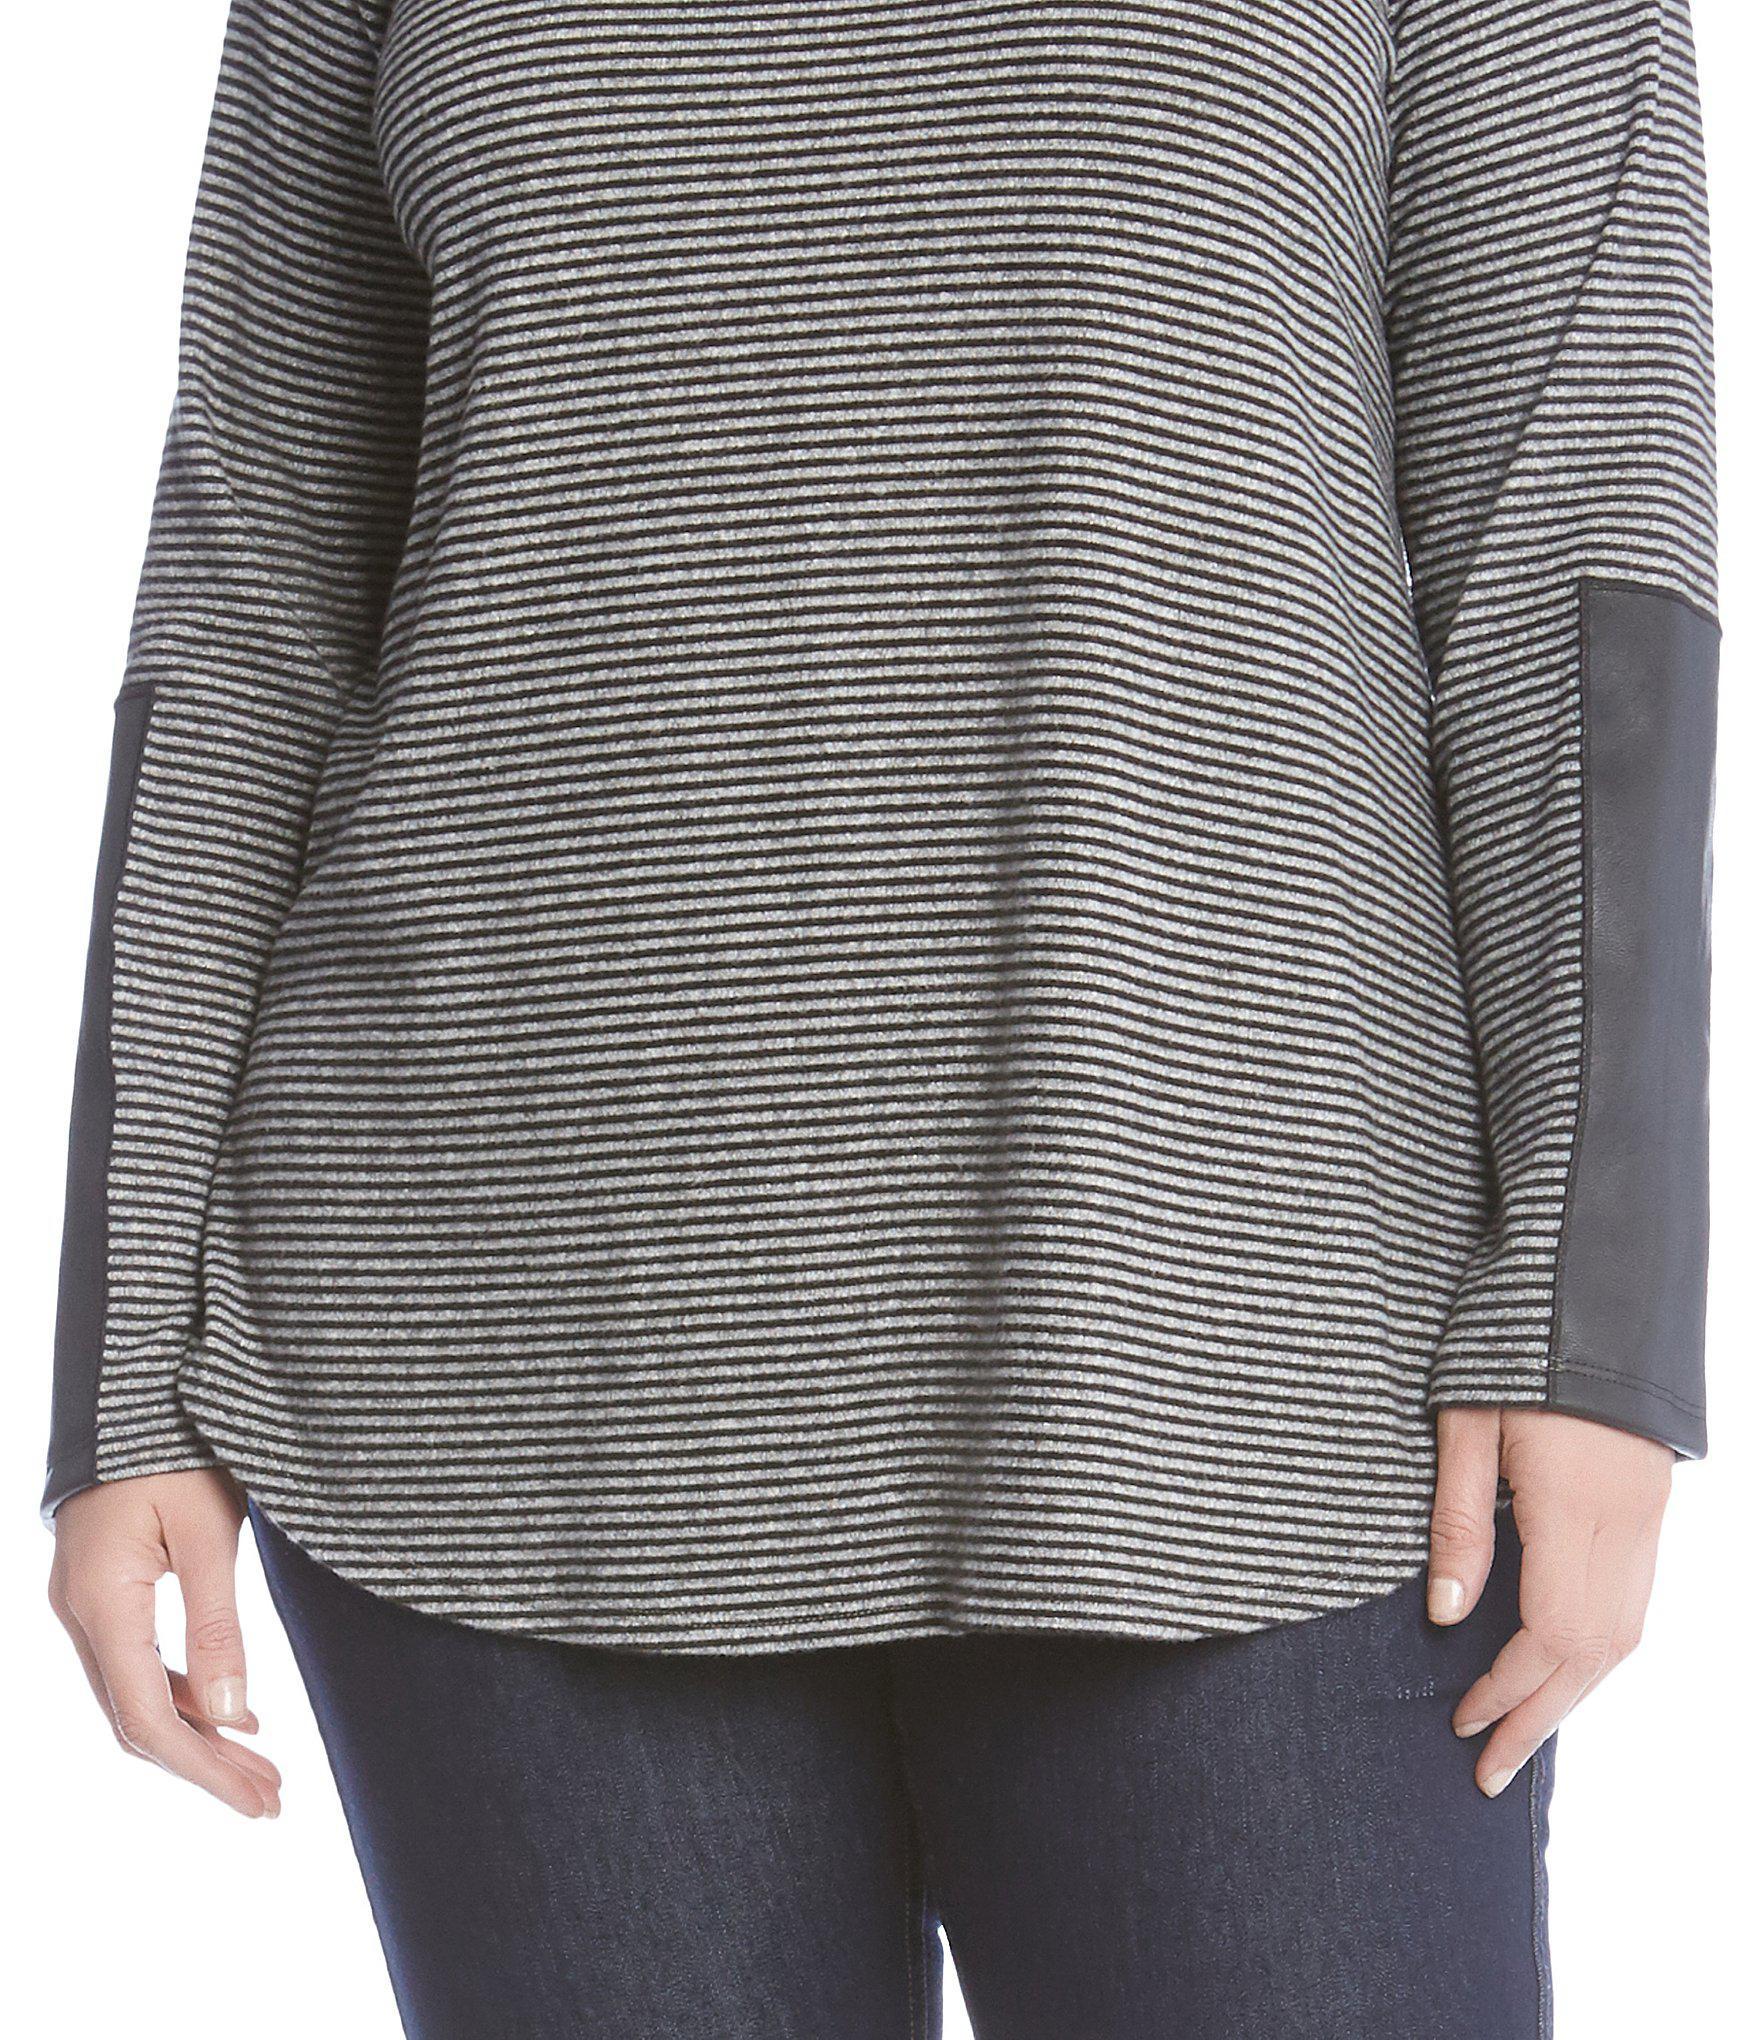 ceff5814f7d Karen Kane - Multicolor Plus Size Faux Leather Sleeve Detail Tee - Lyst.  View fullscreen